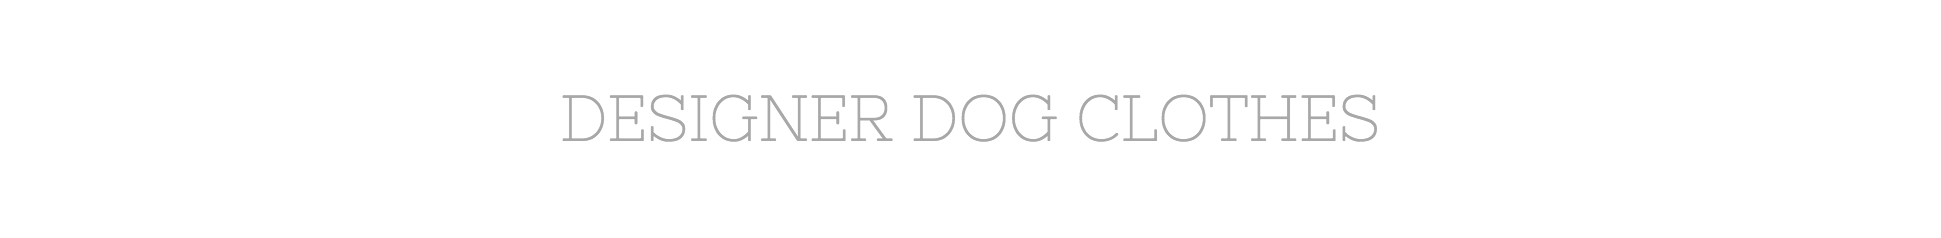 Dog Clothes | Designer Dog Clothes | Dog Hoodie